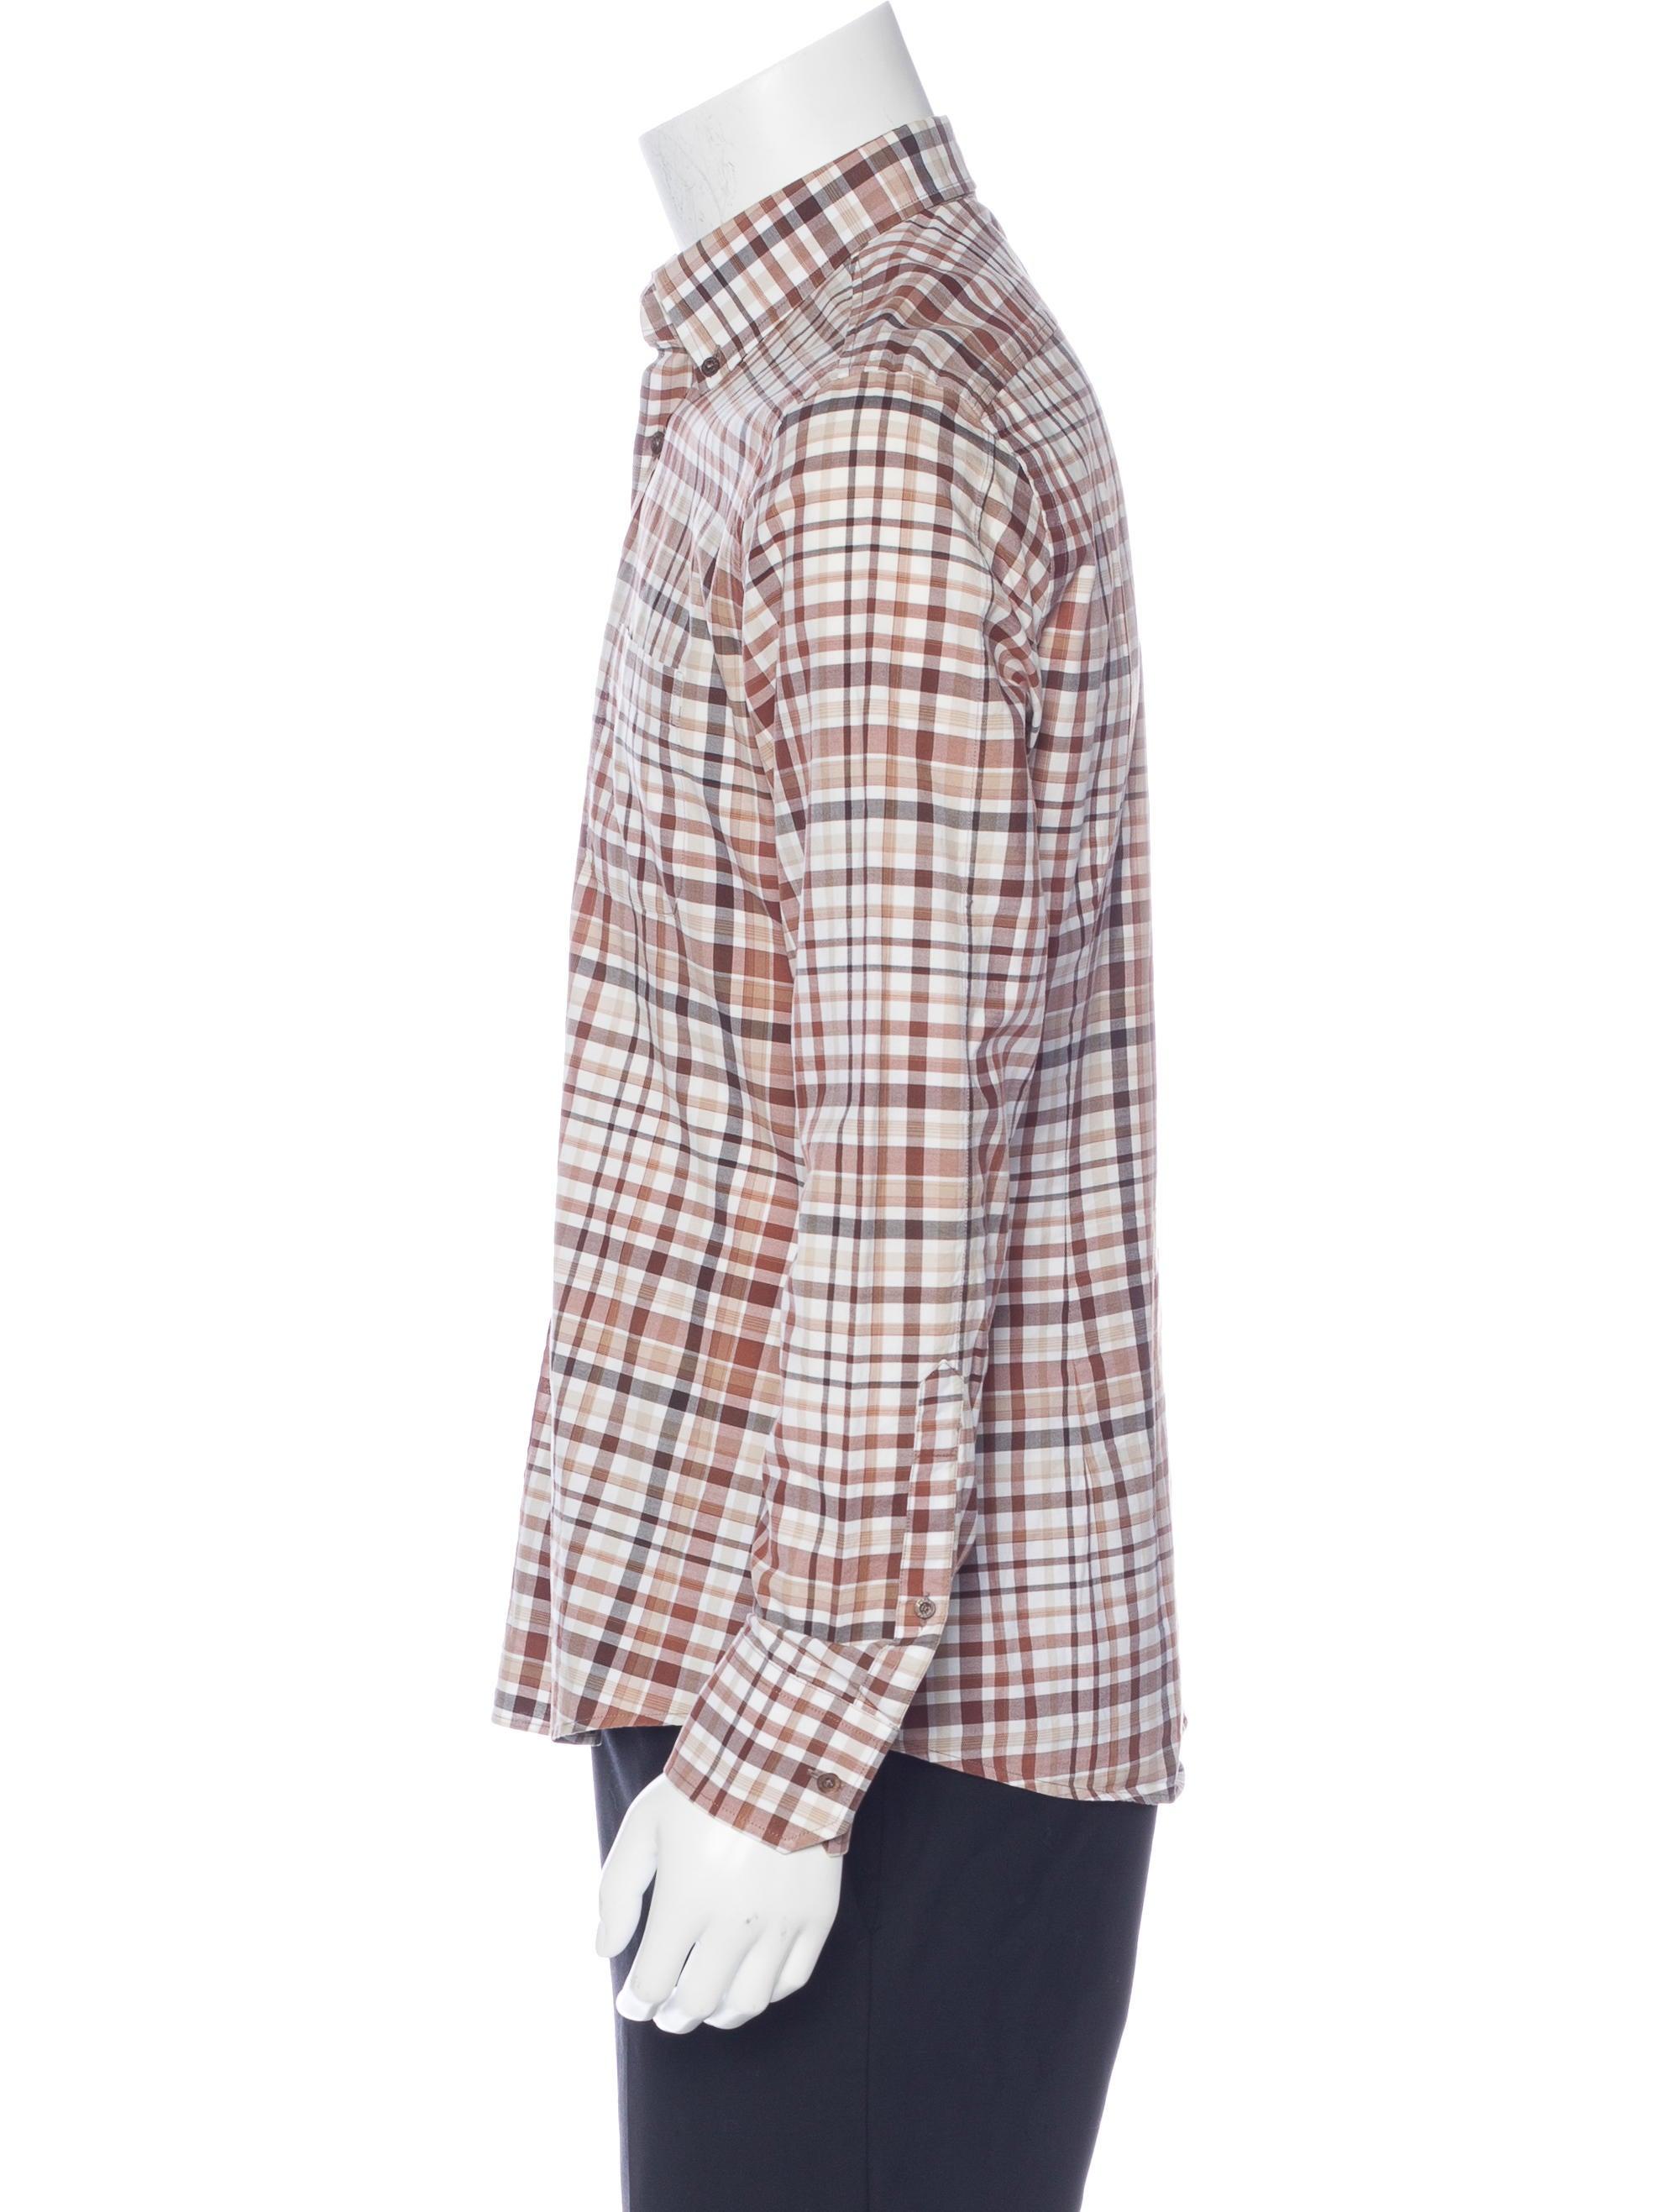 Gucci Plaid Button-Up Shirt - Clothing - GUC153547 | The ...